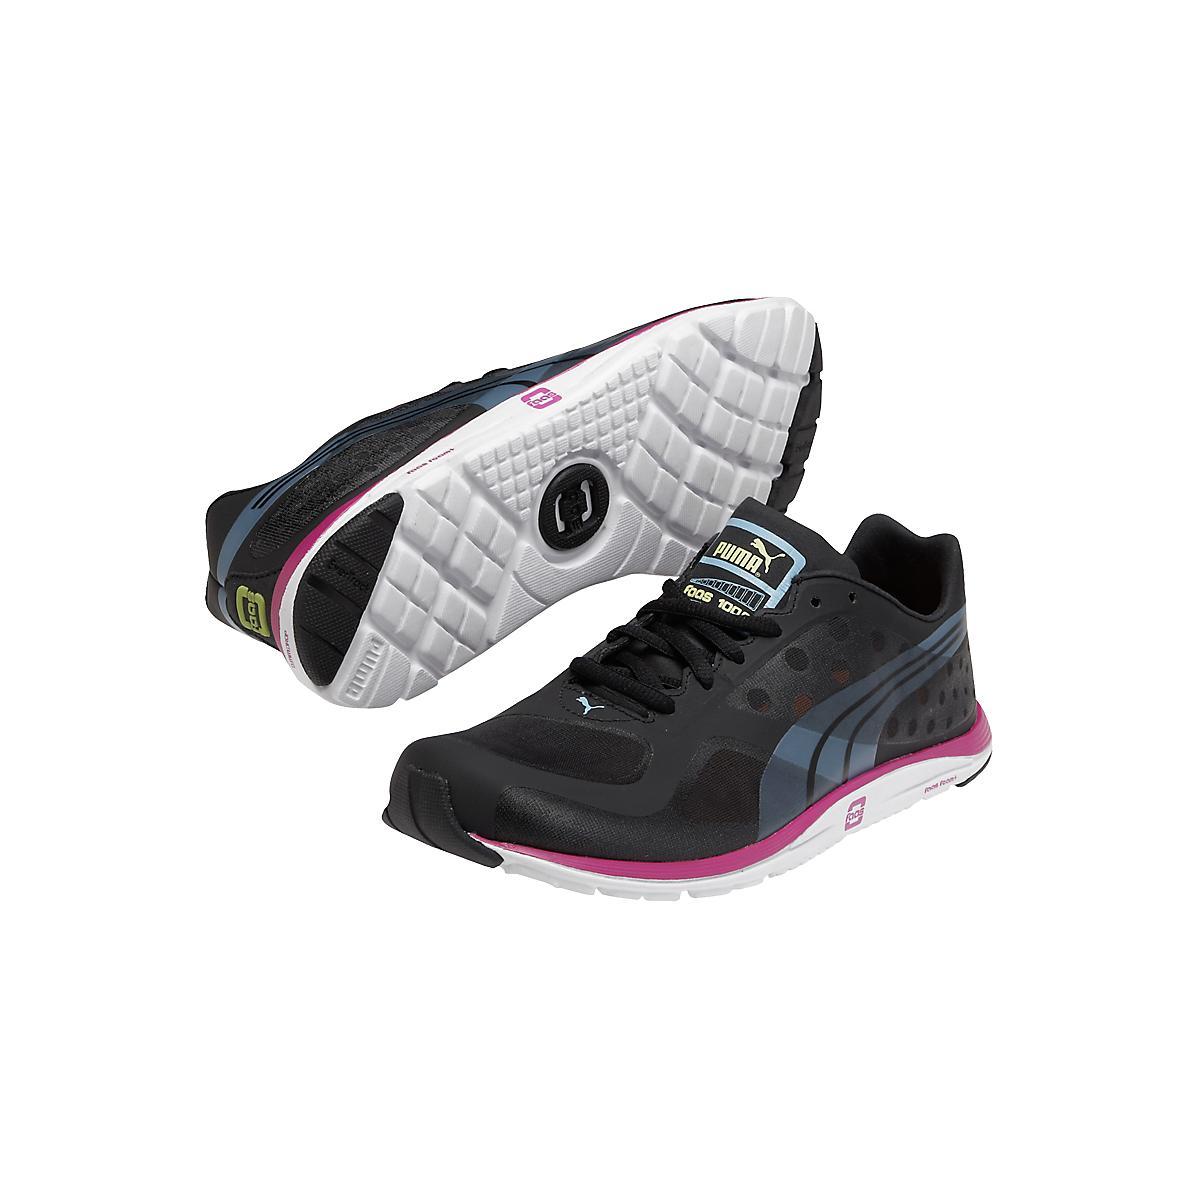 30563d9ccfaa Womens Puma Faas 100 R Running Shoe at Road Runner Sports